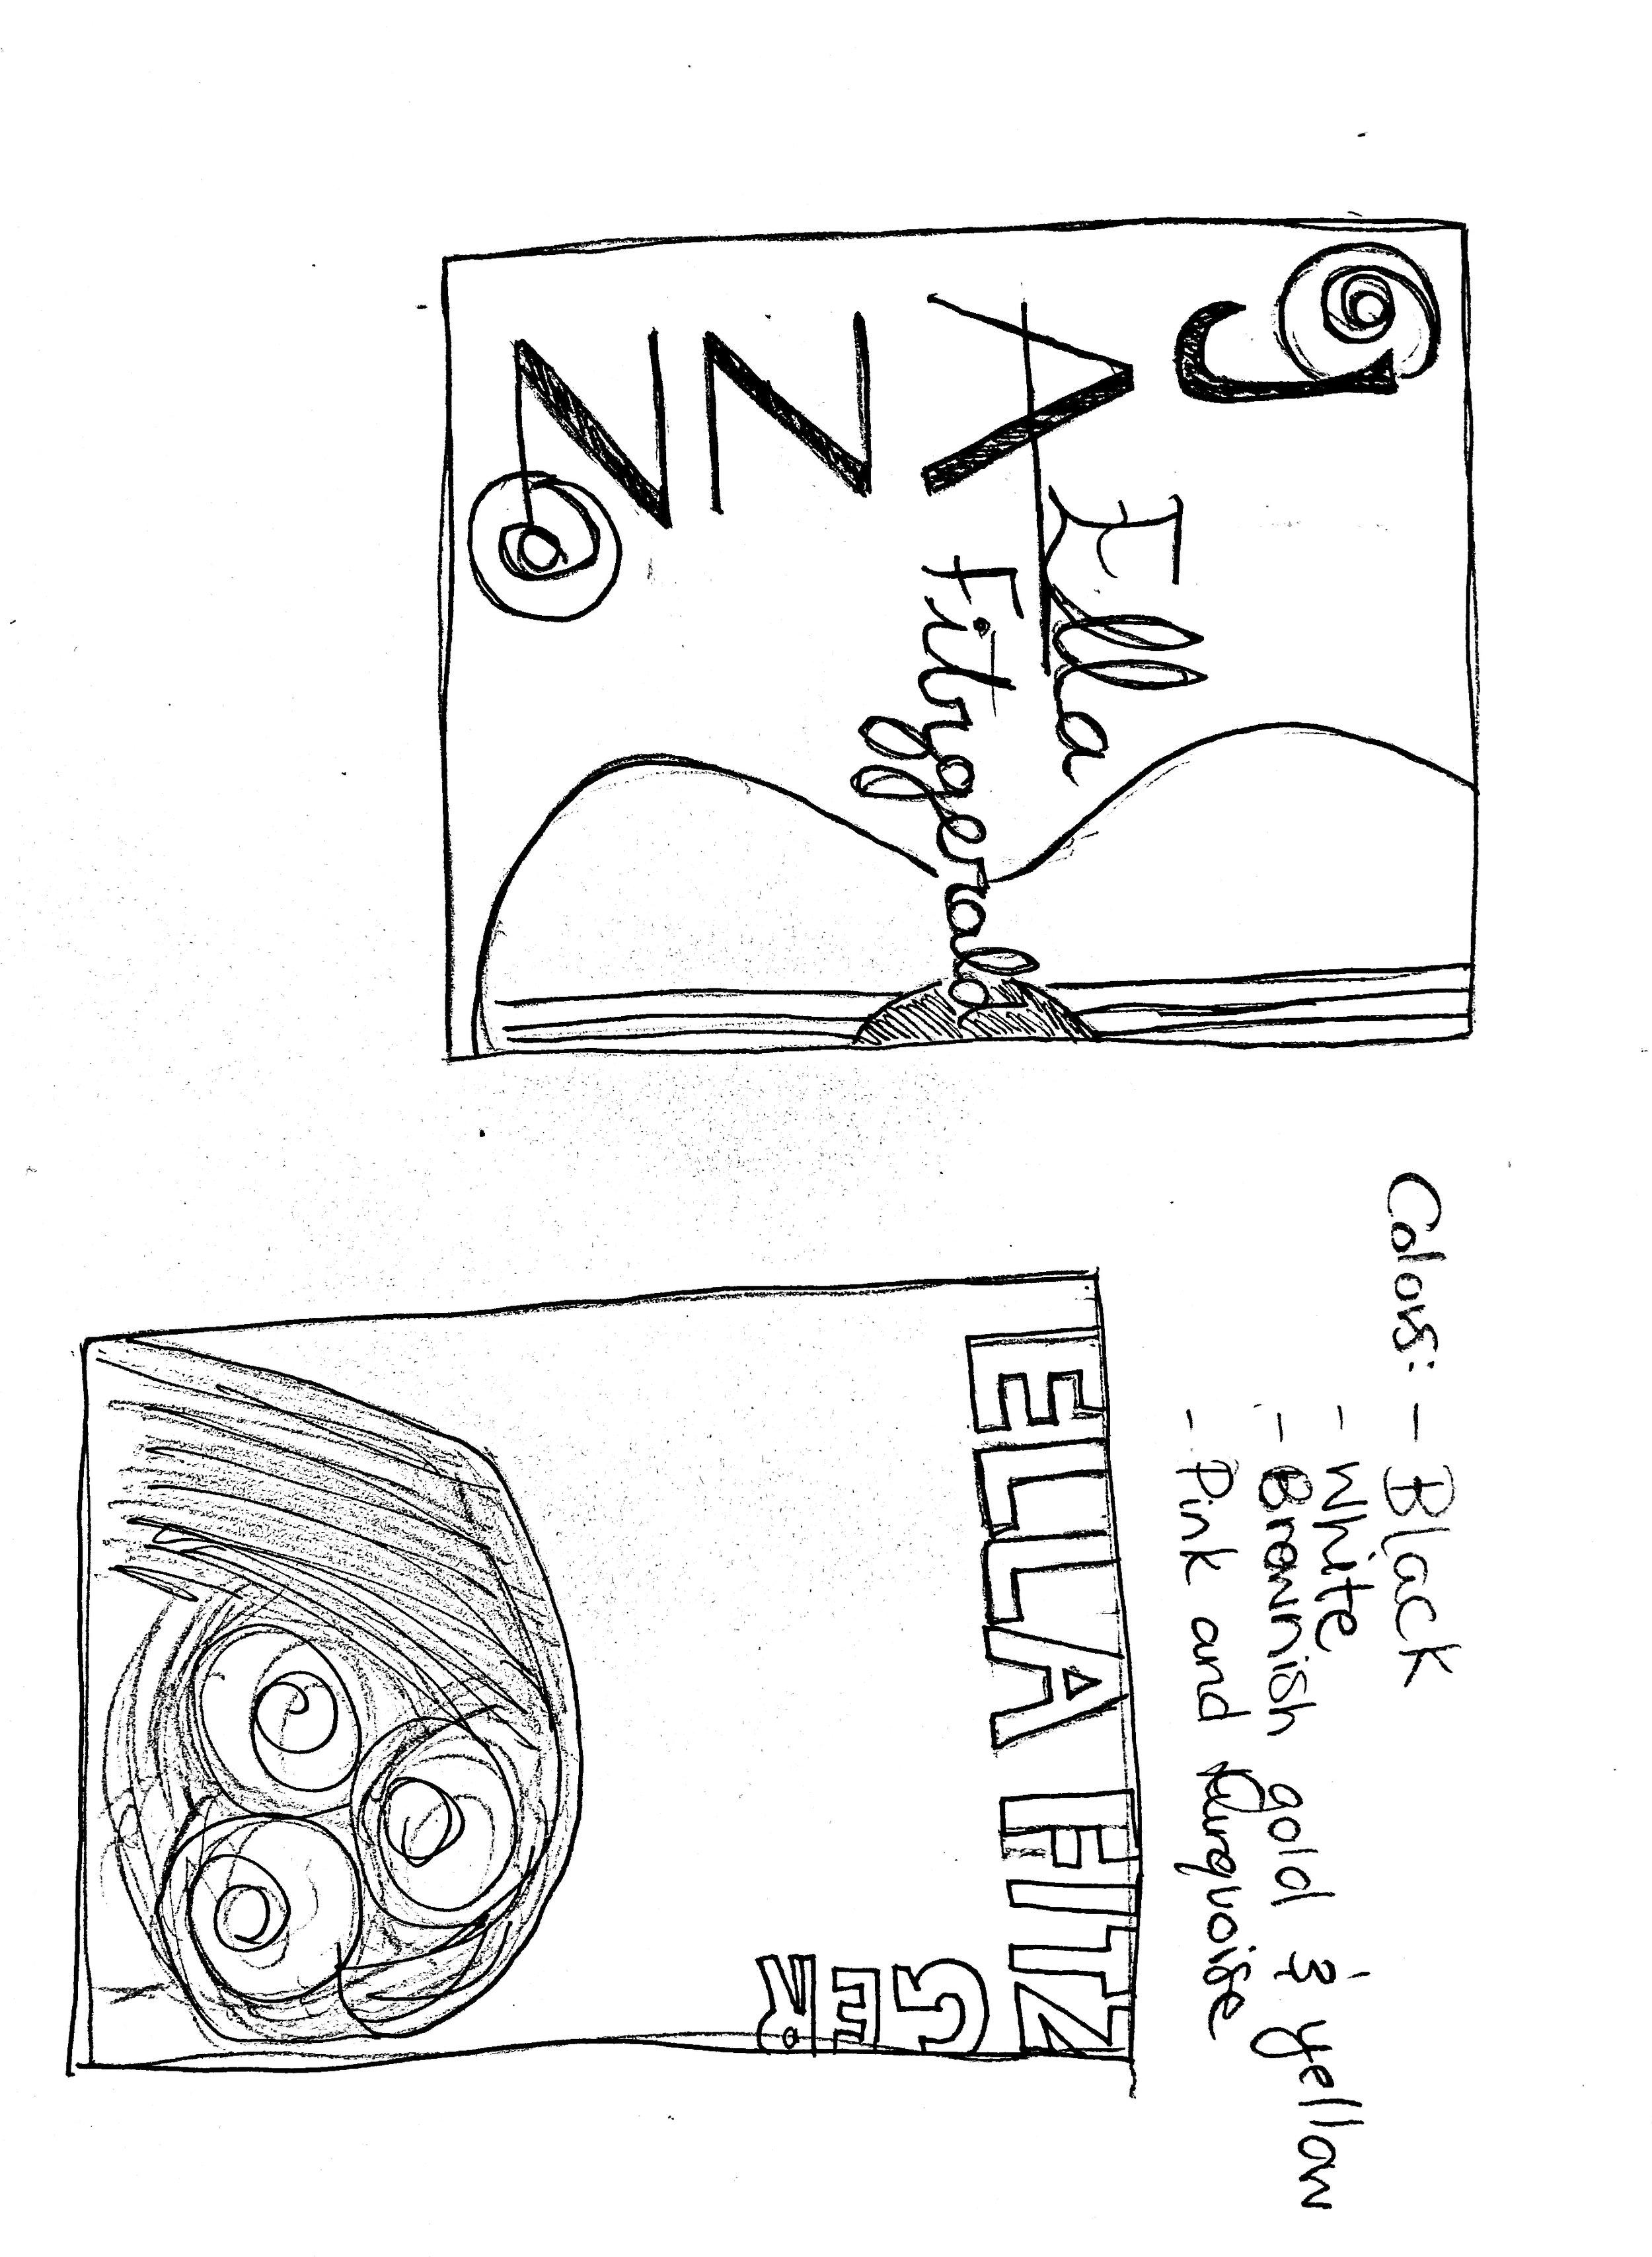 Dec 21%2c Doc 1 Page 2.jpg